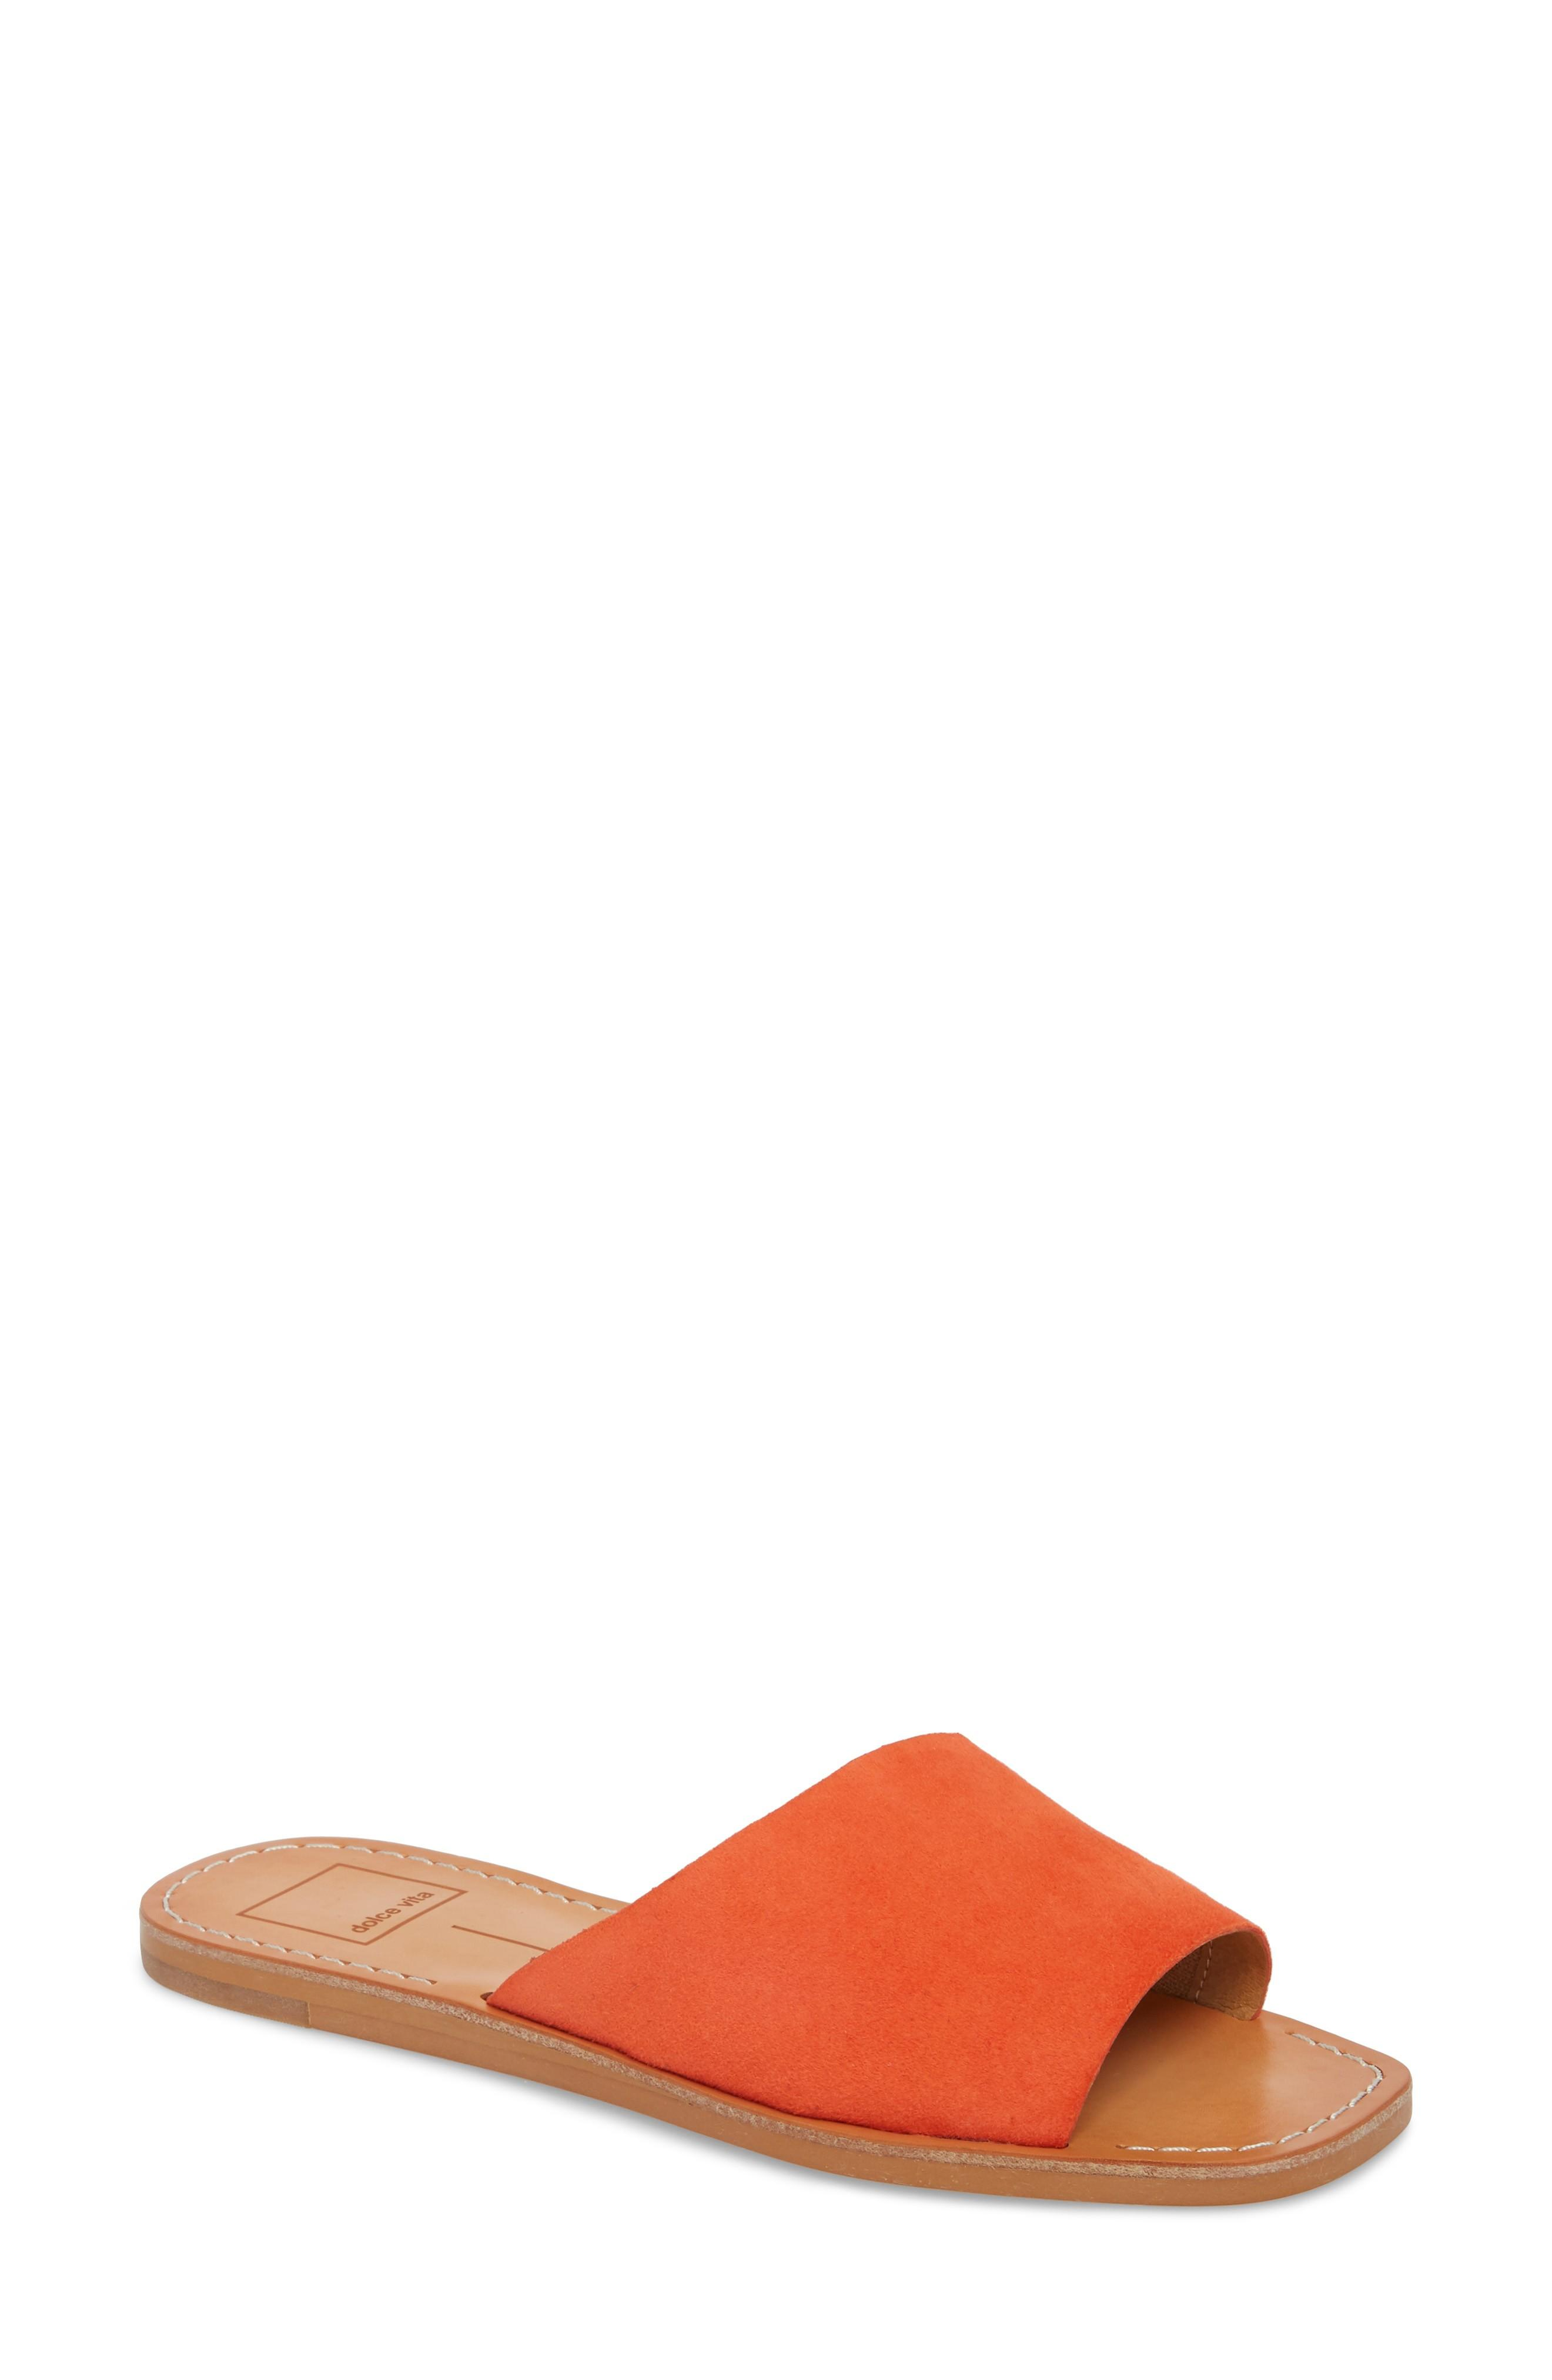 208323b5a Dolce Vita Cato Asymmetrical Slide Sandal In Orange Suede | ModeSens